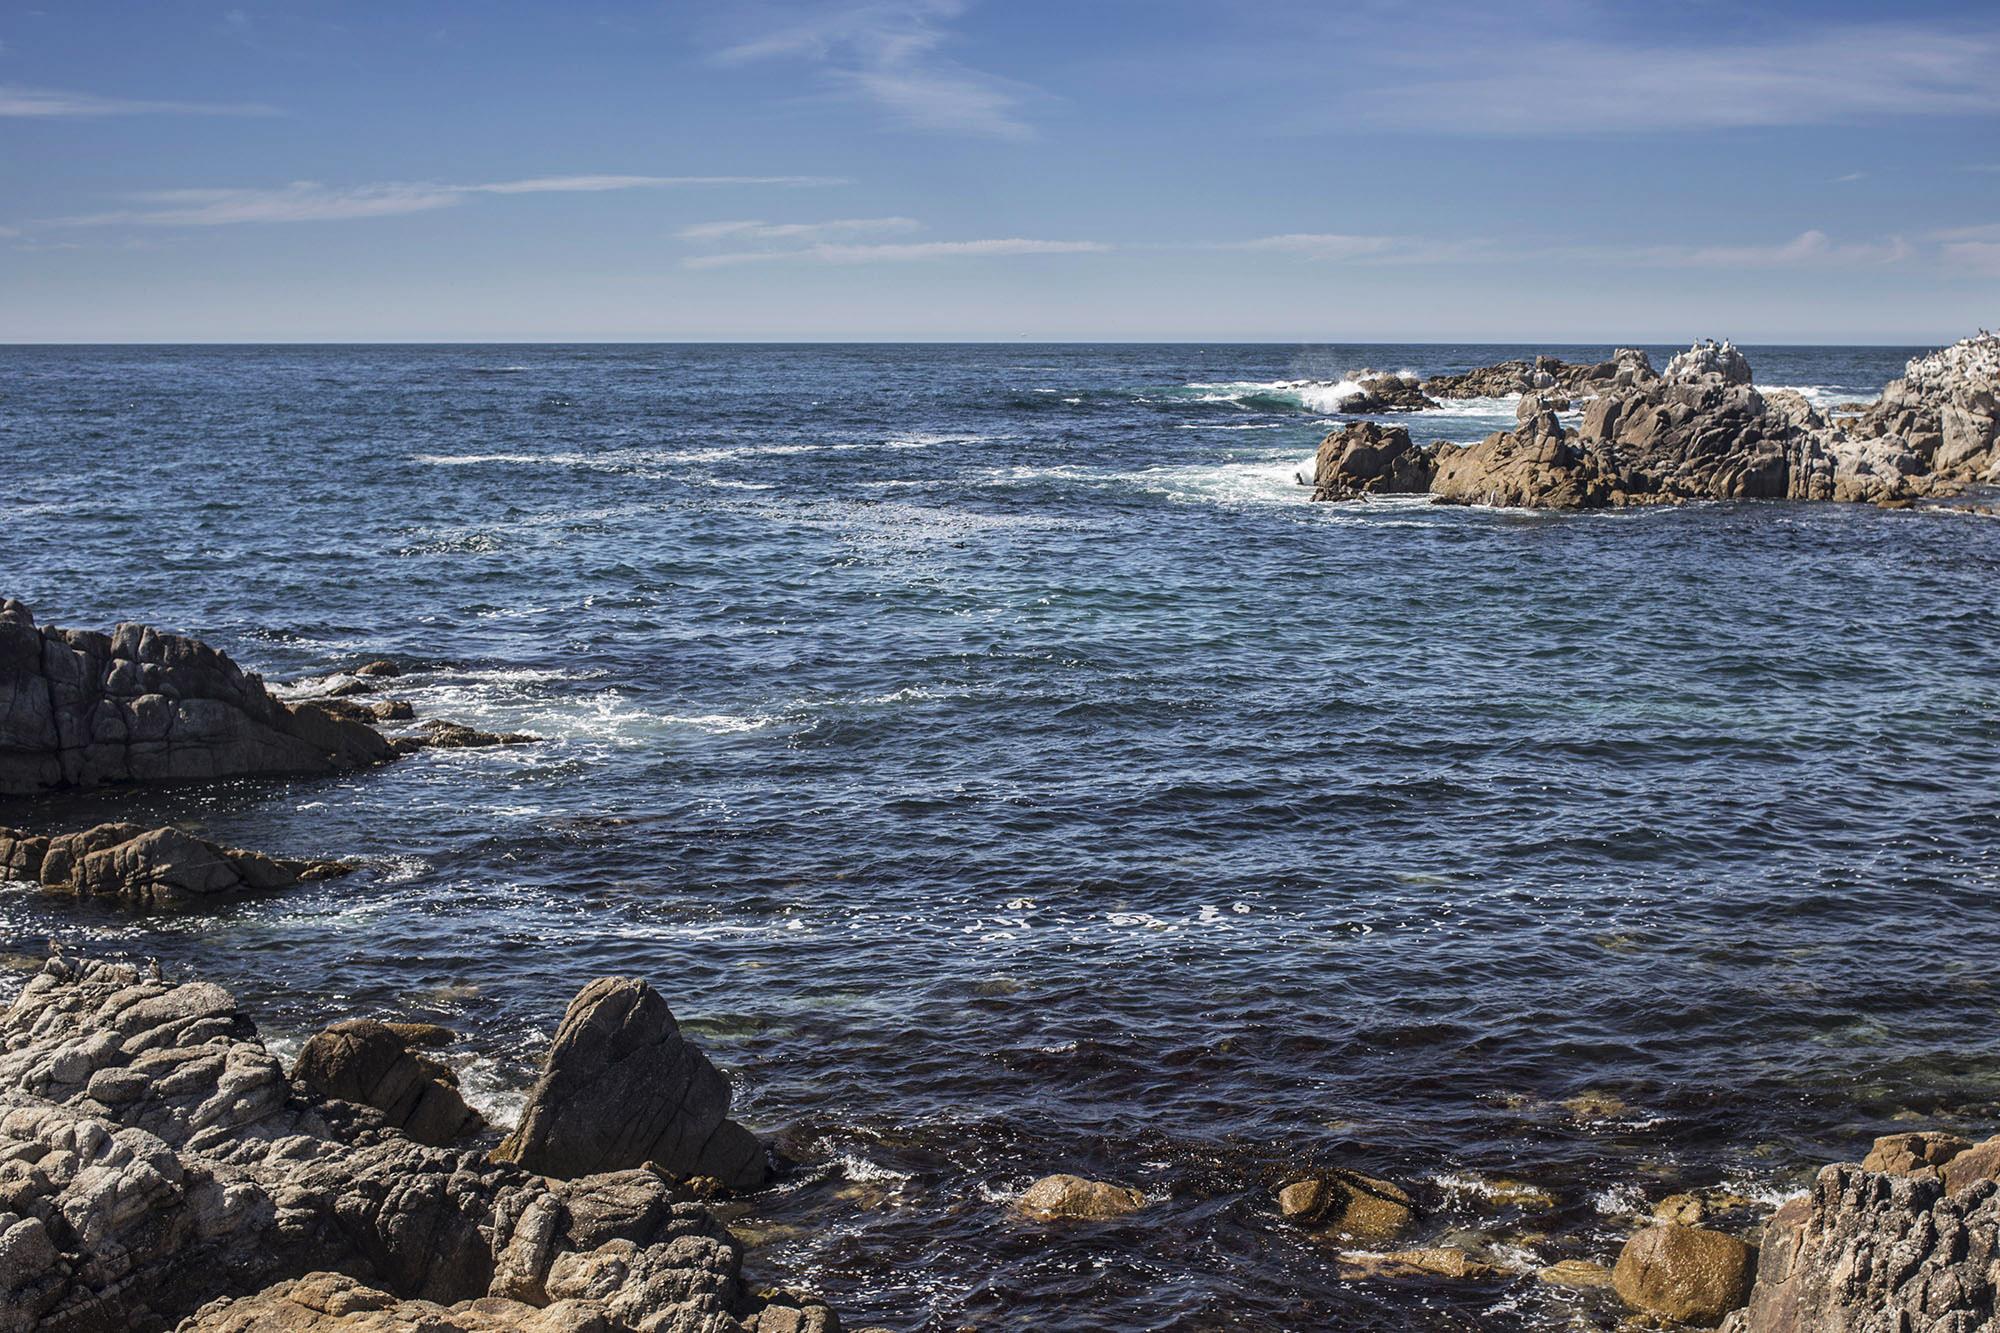 Rocky Shores no3 by Rich J. Velasco